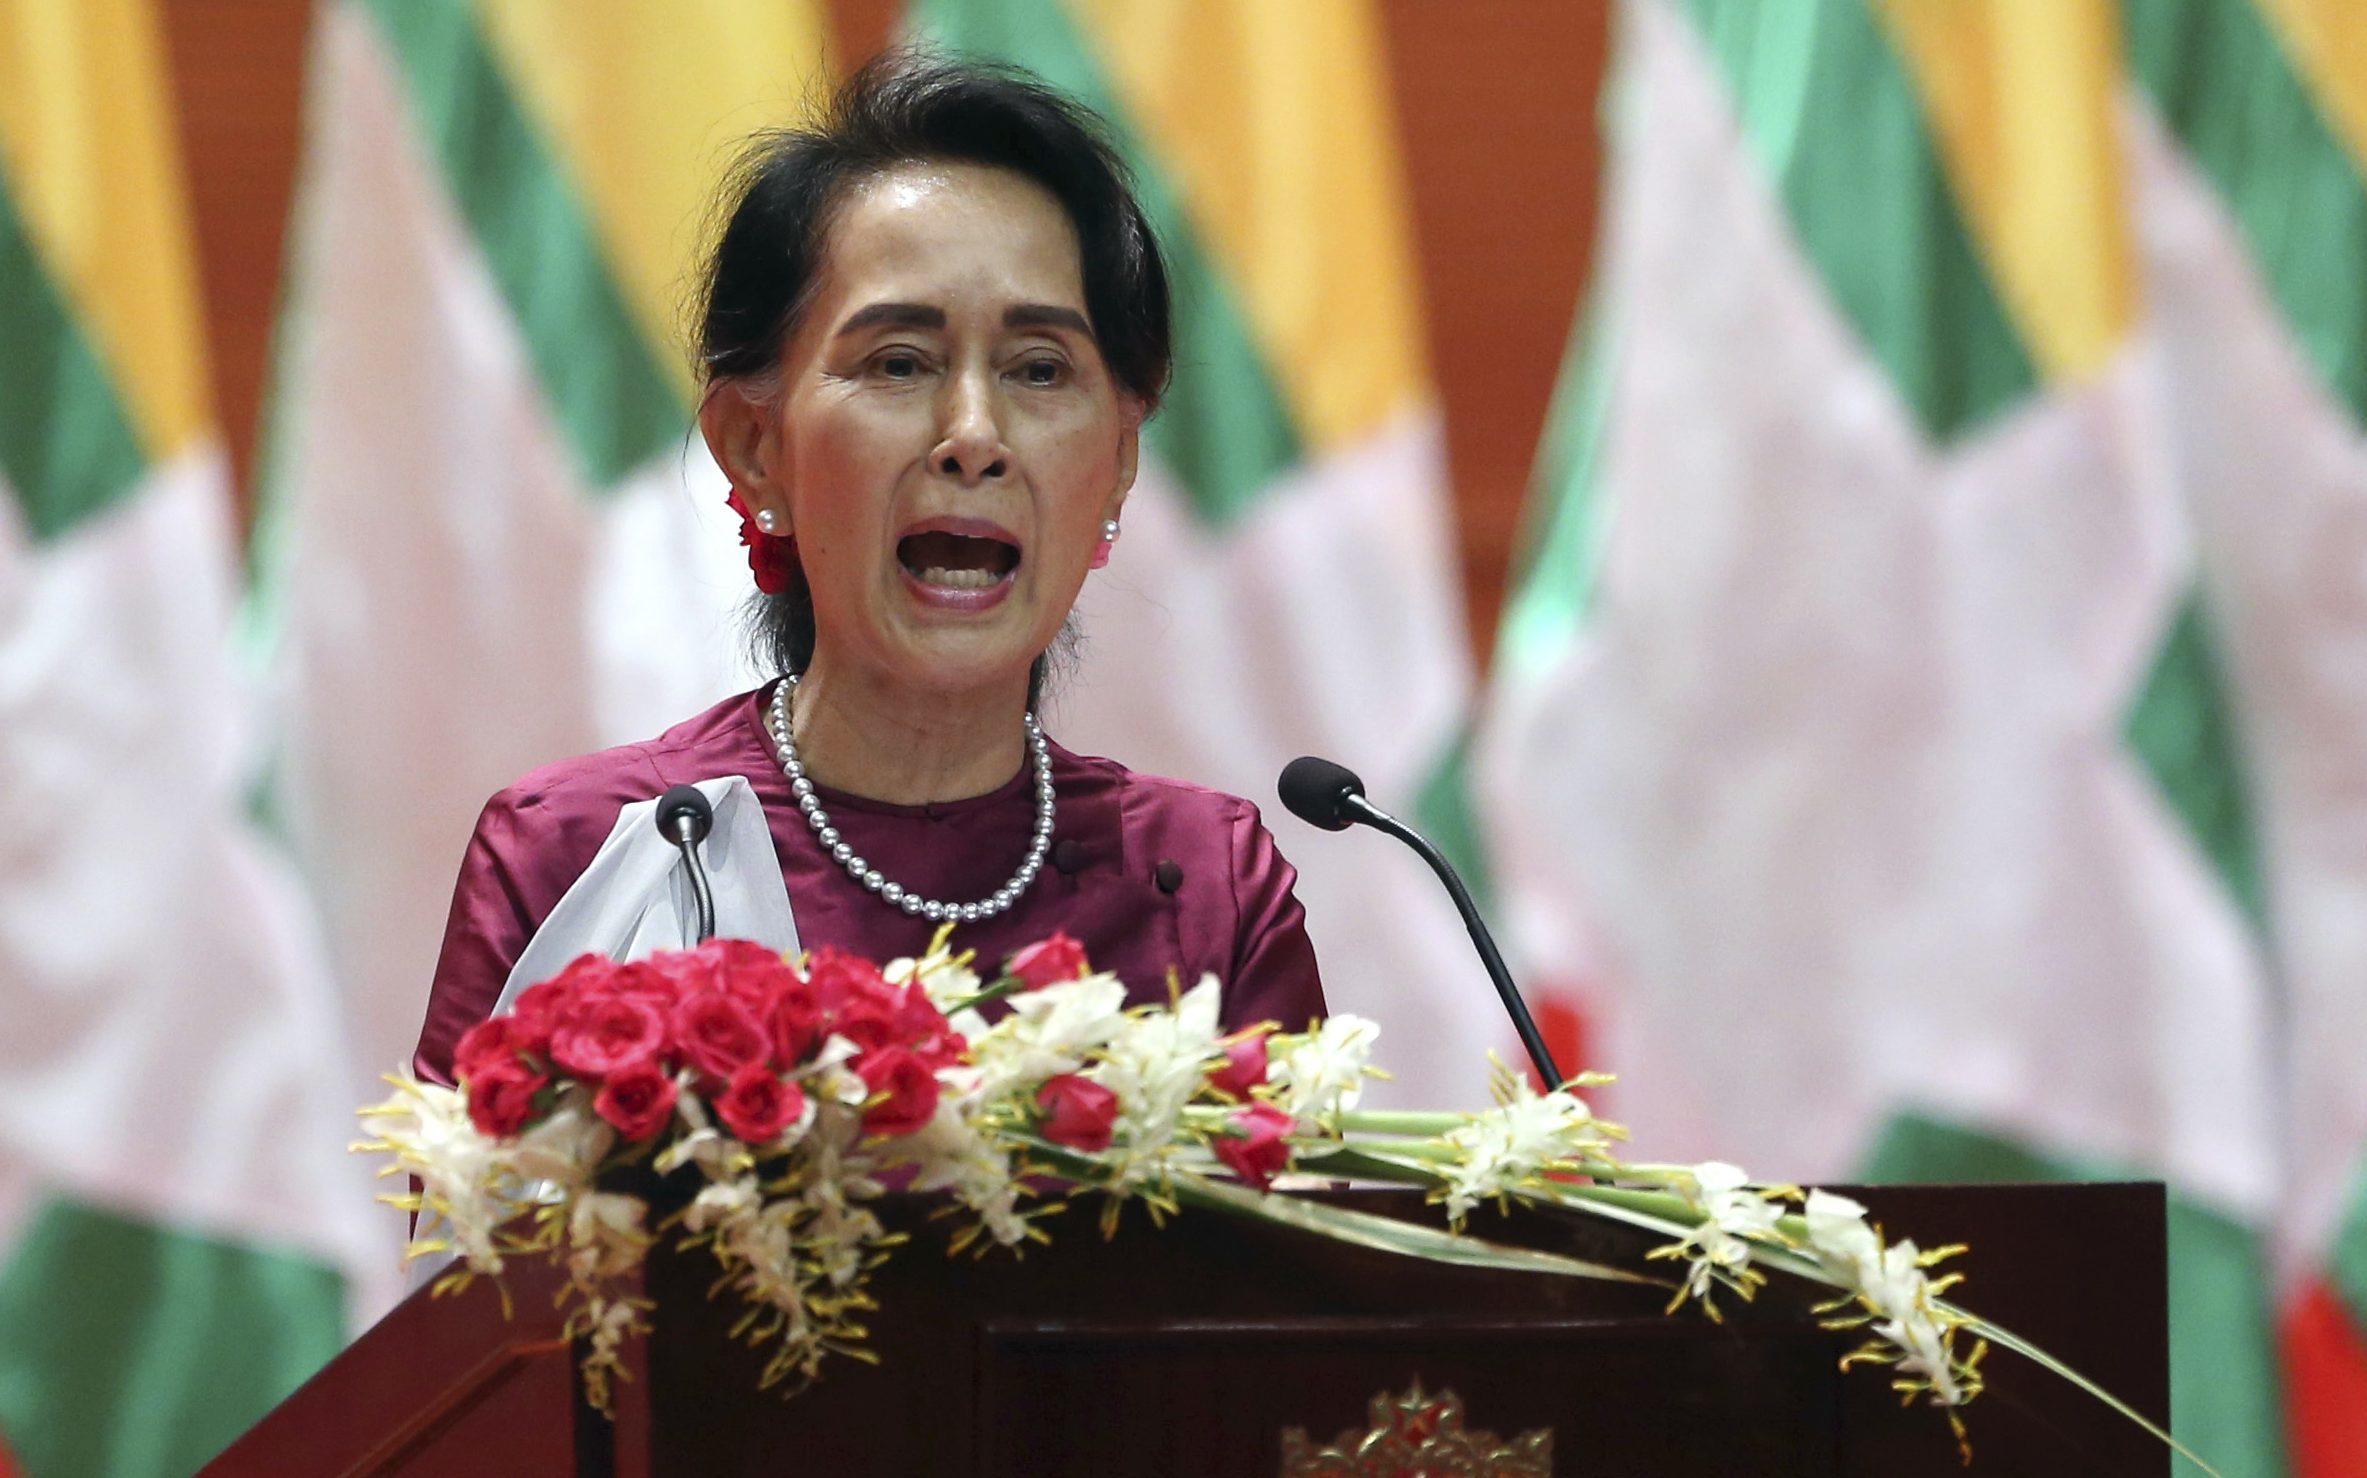 Myanmar's State Counsellor Aung San Suu Kyi (AP Photo/Aung Shine Oo)